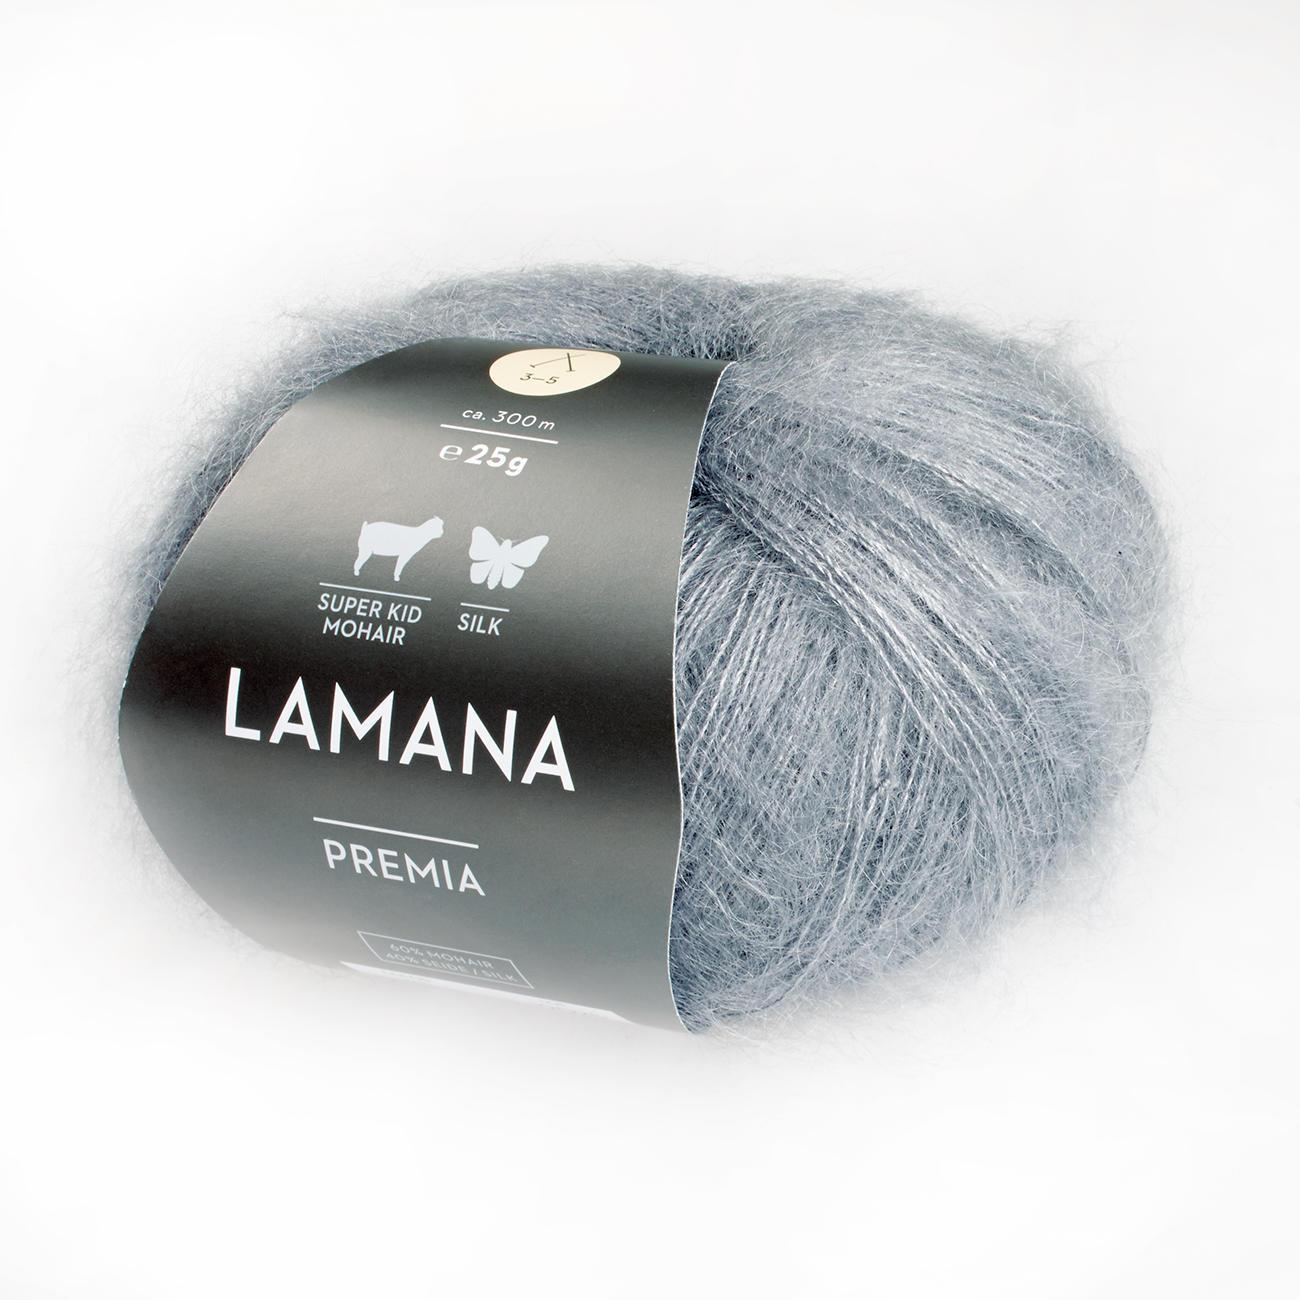 Wolle Lamana GmbH Premia Burgund 11 x 10 x 4 cm